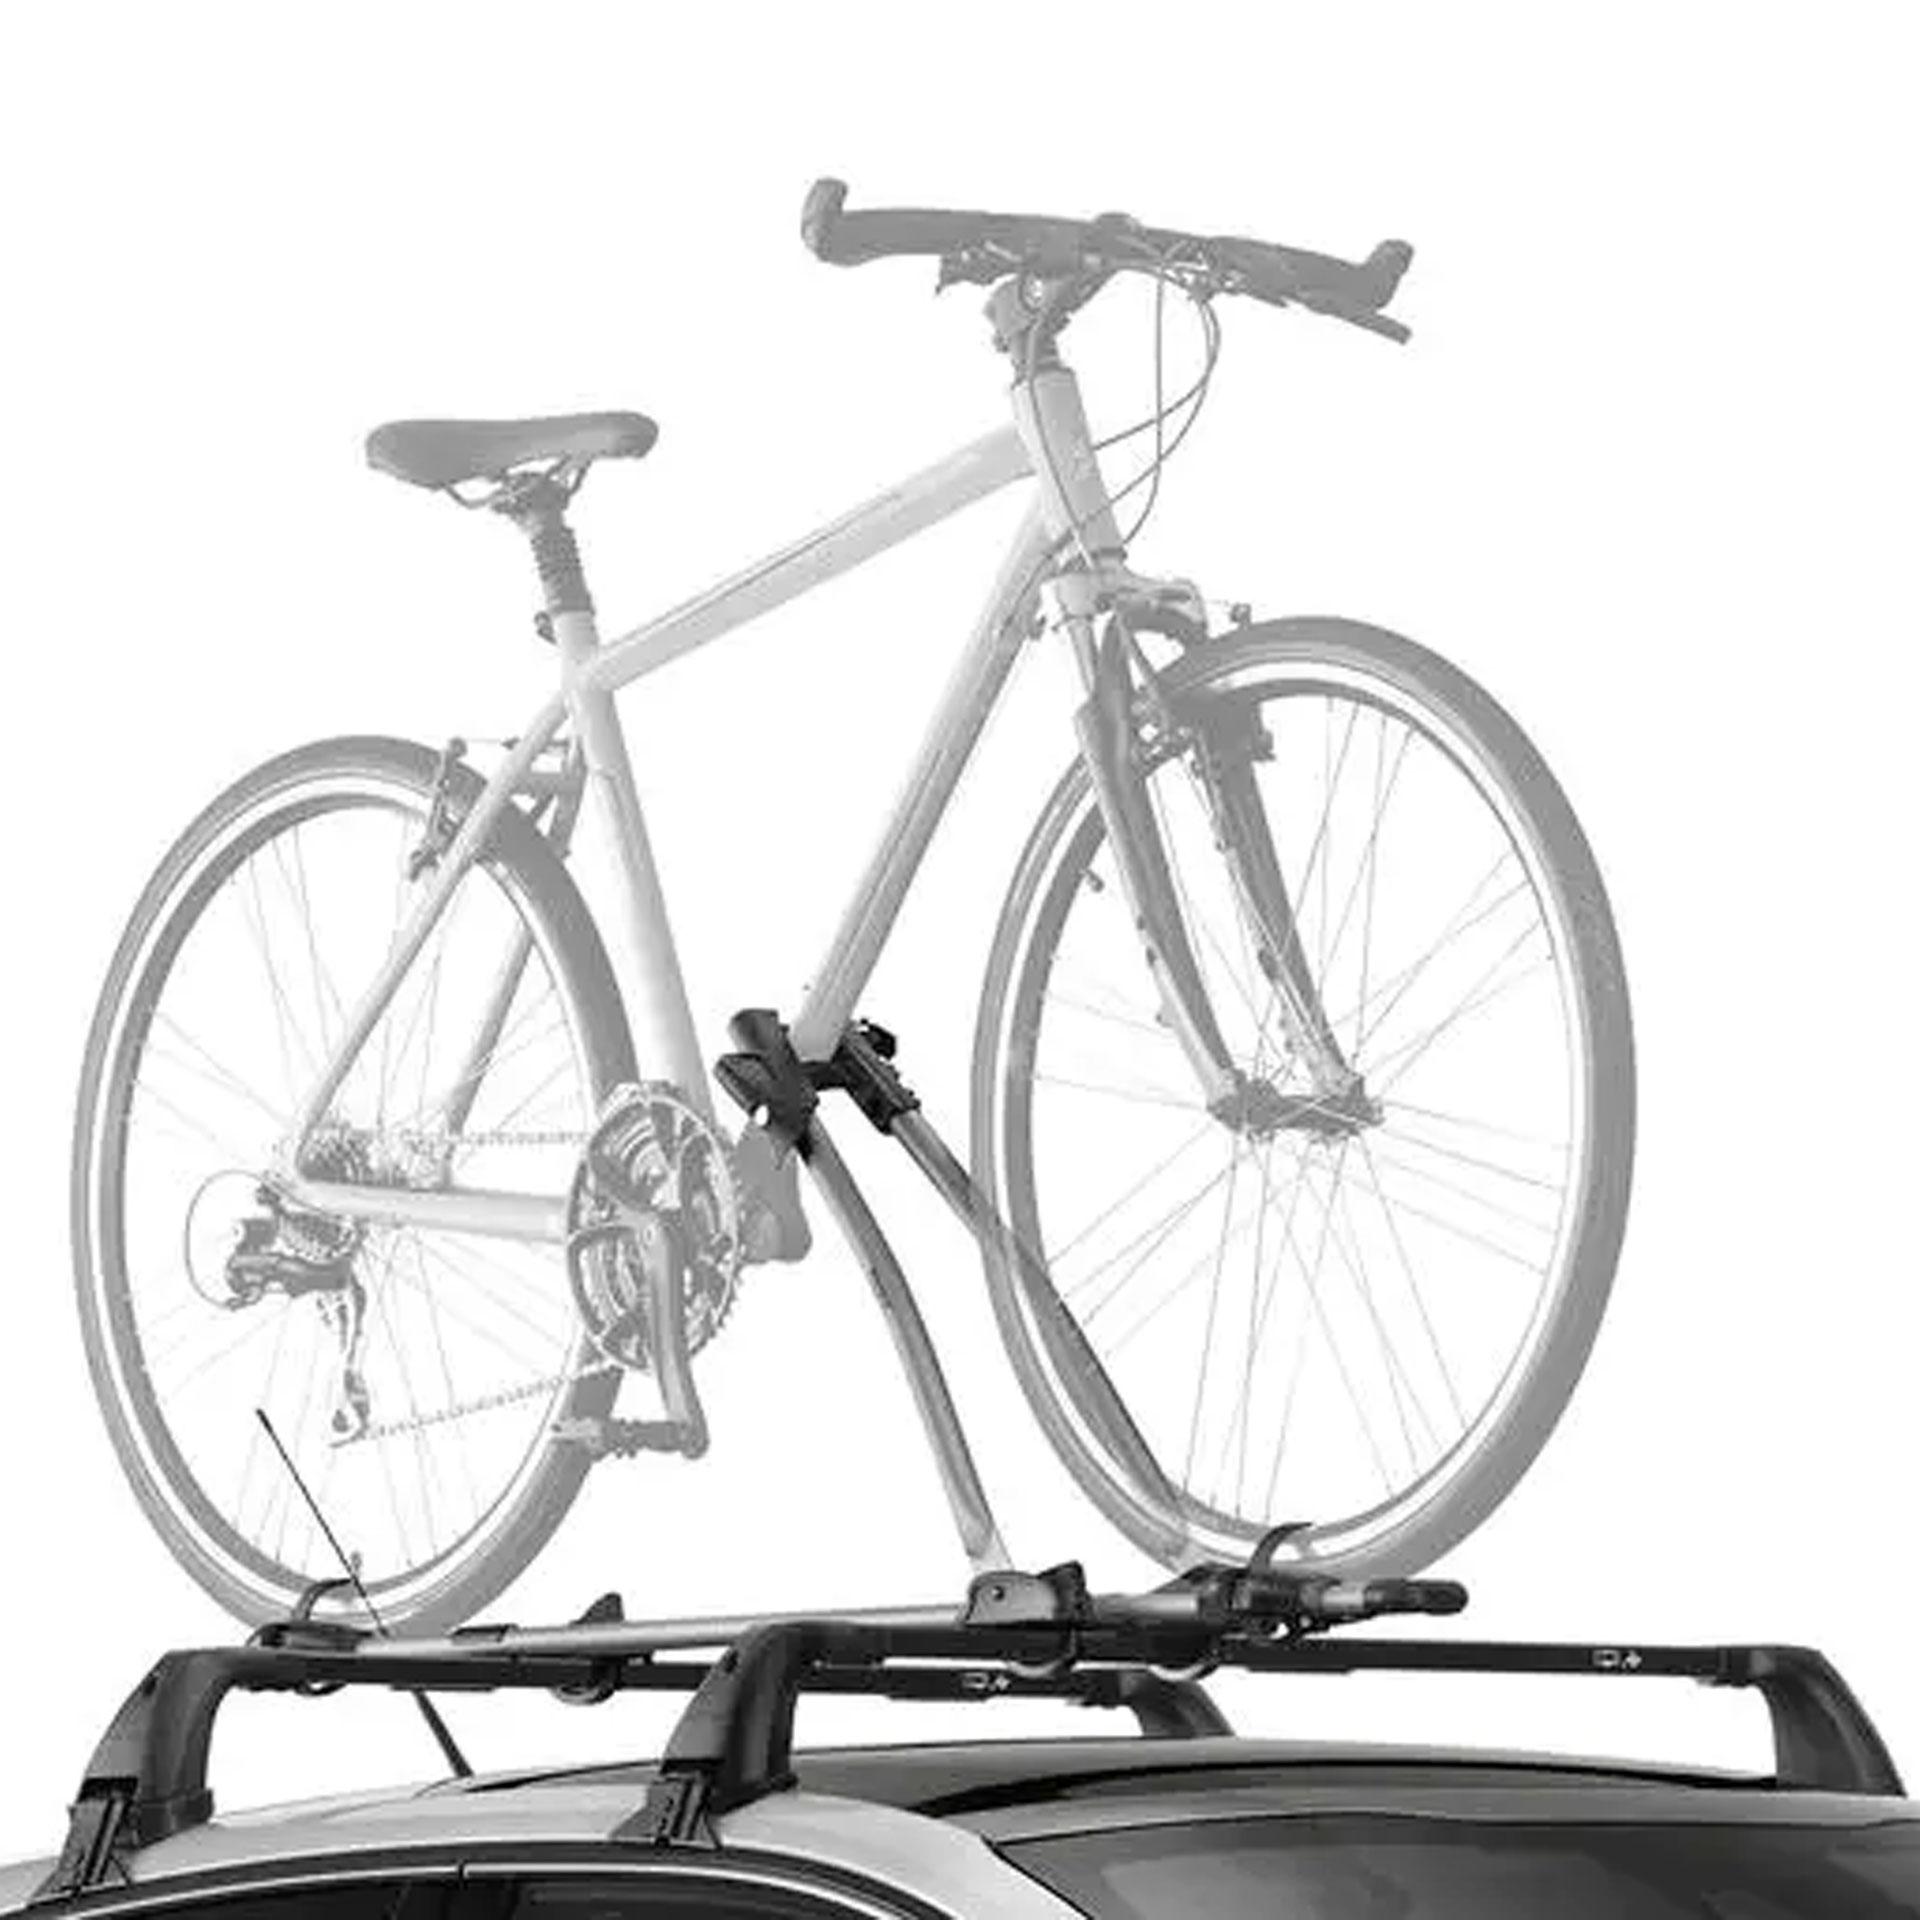 PEUGEOT Fahrradträger auf Dachgrundträger für 1 Fahrrad